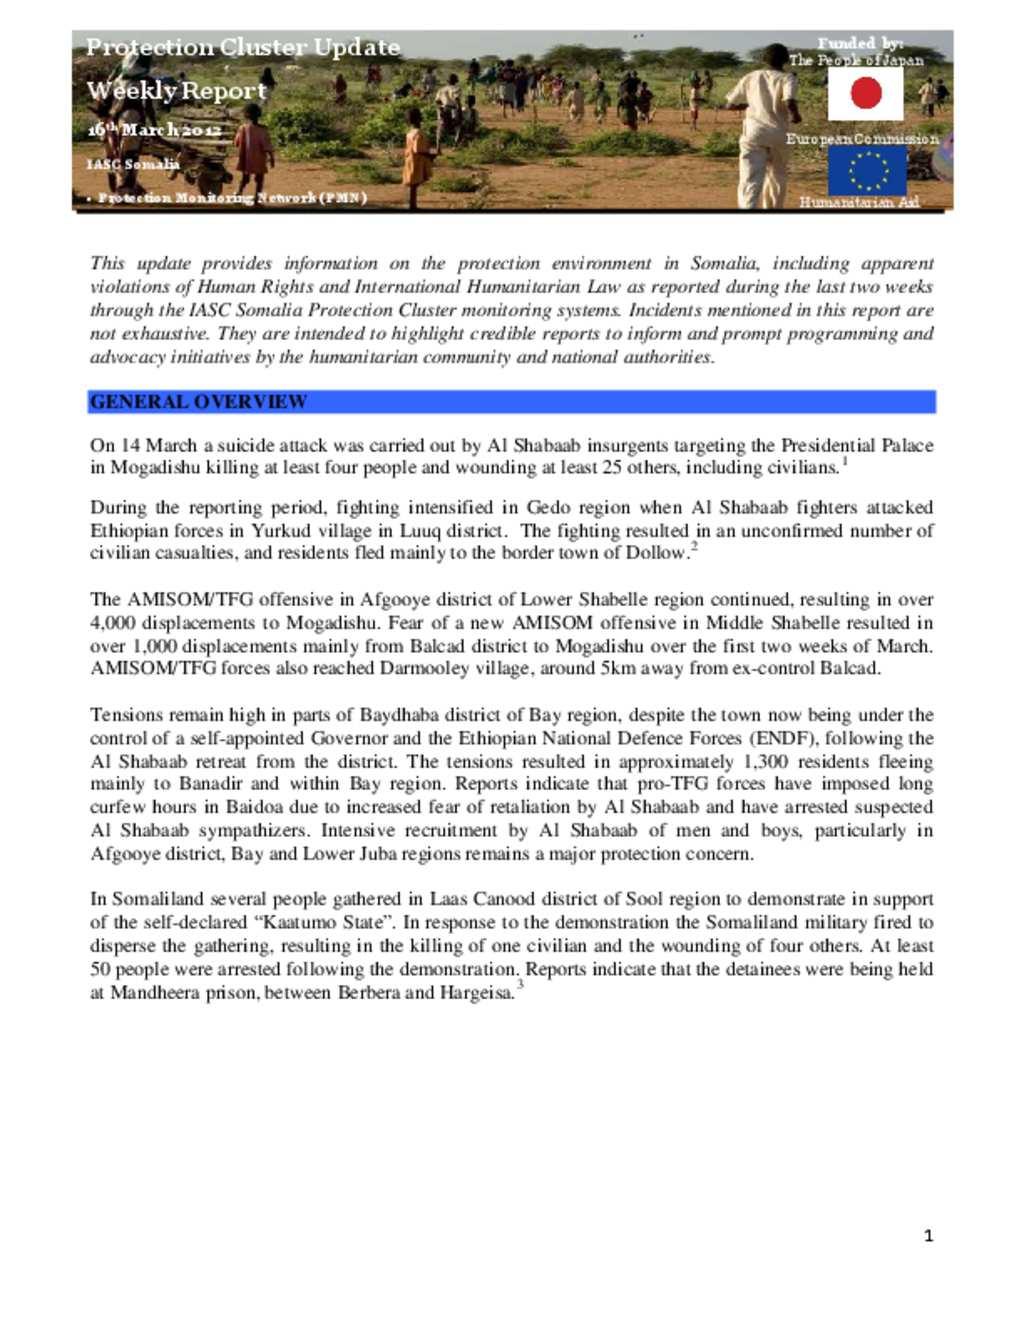 Document - PMN update 3 -16 March 2012